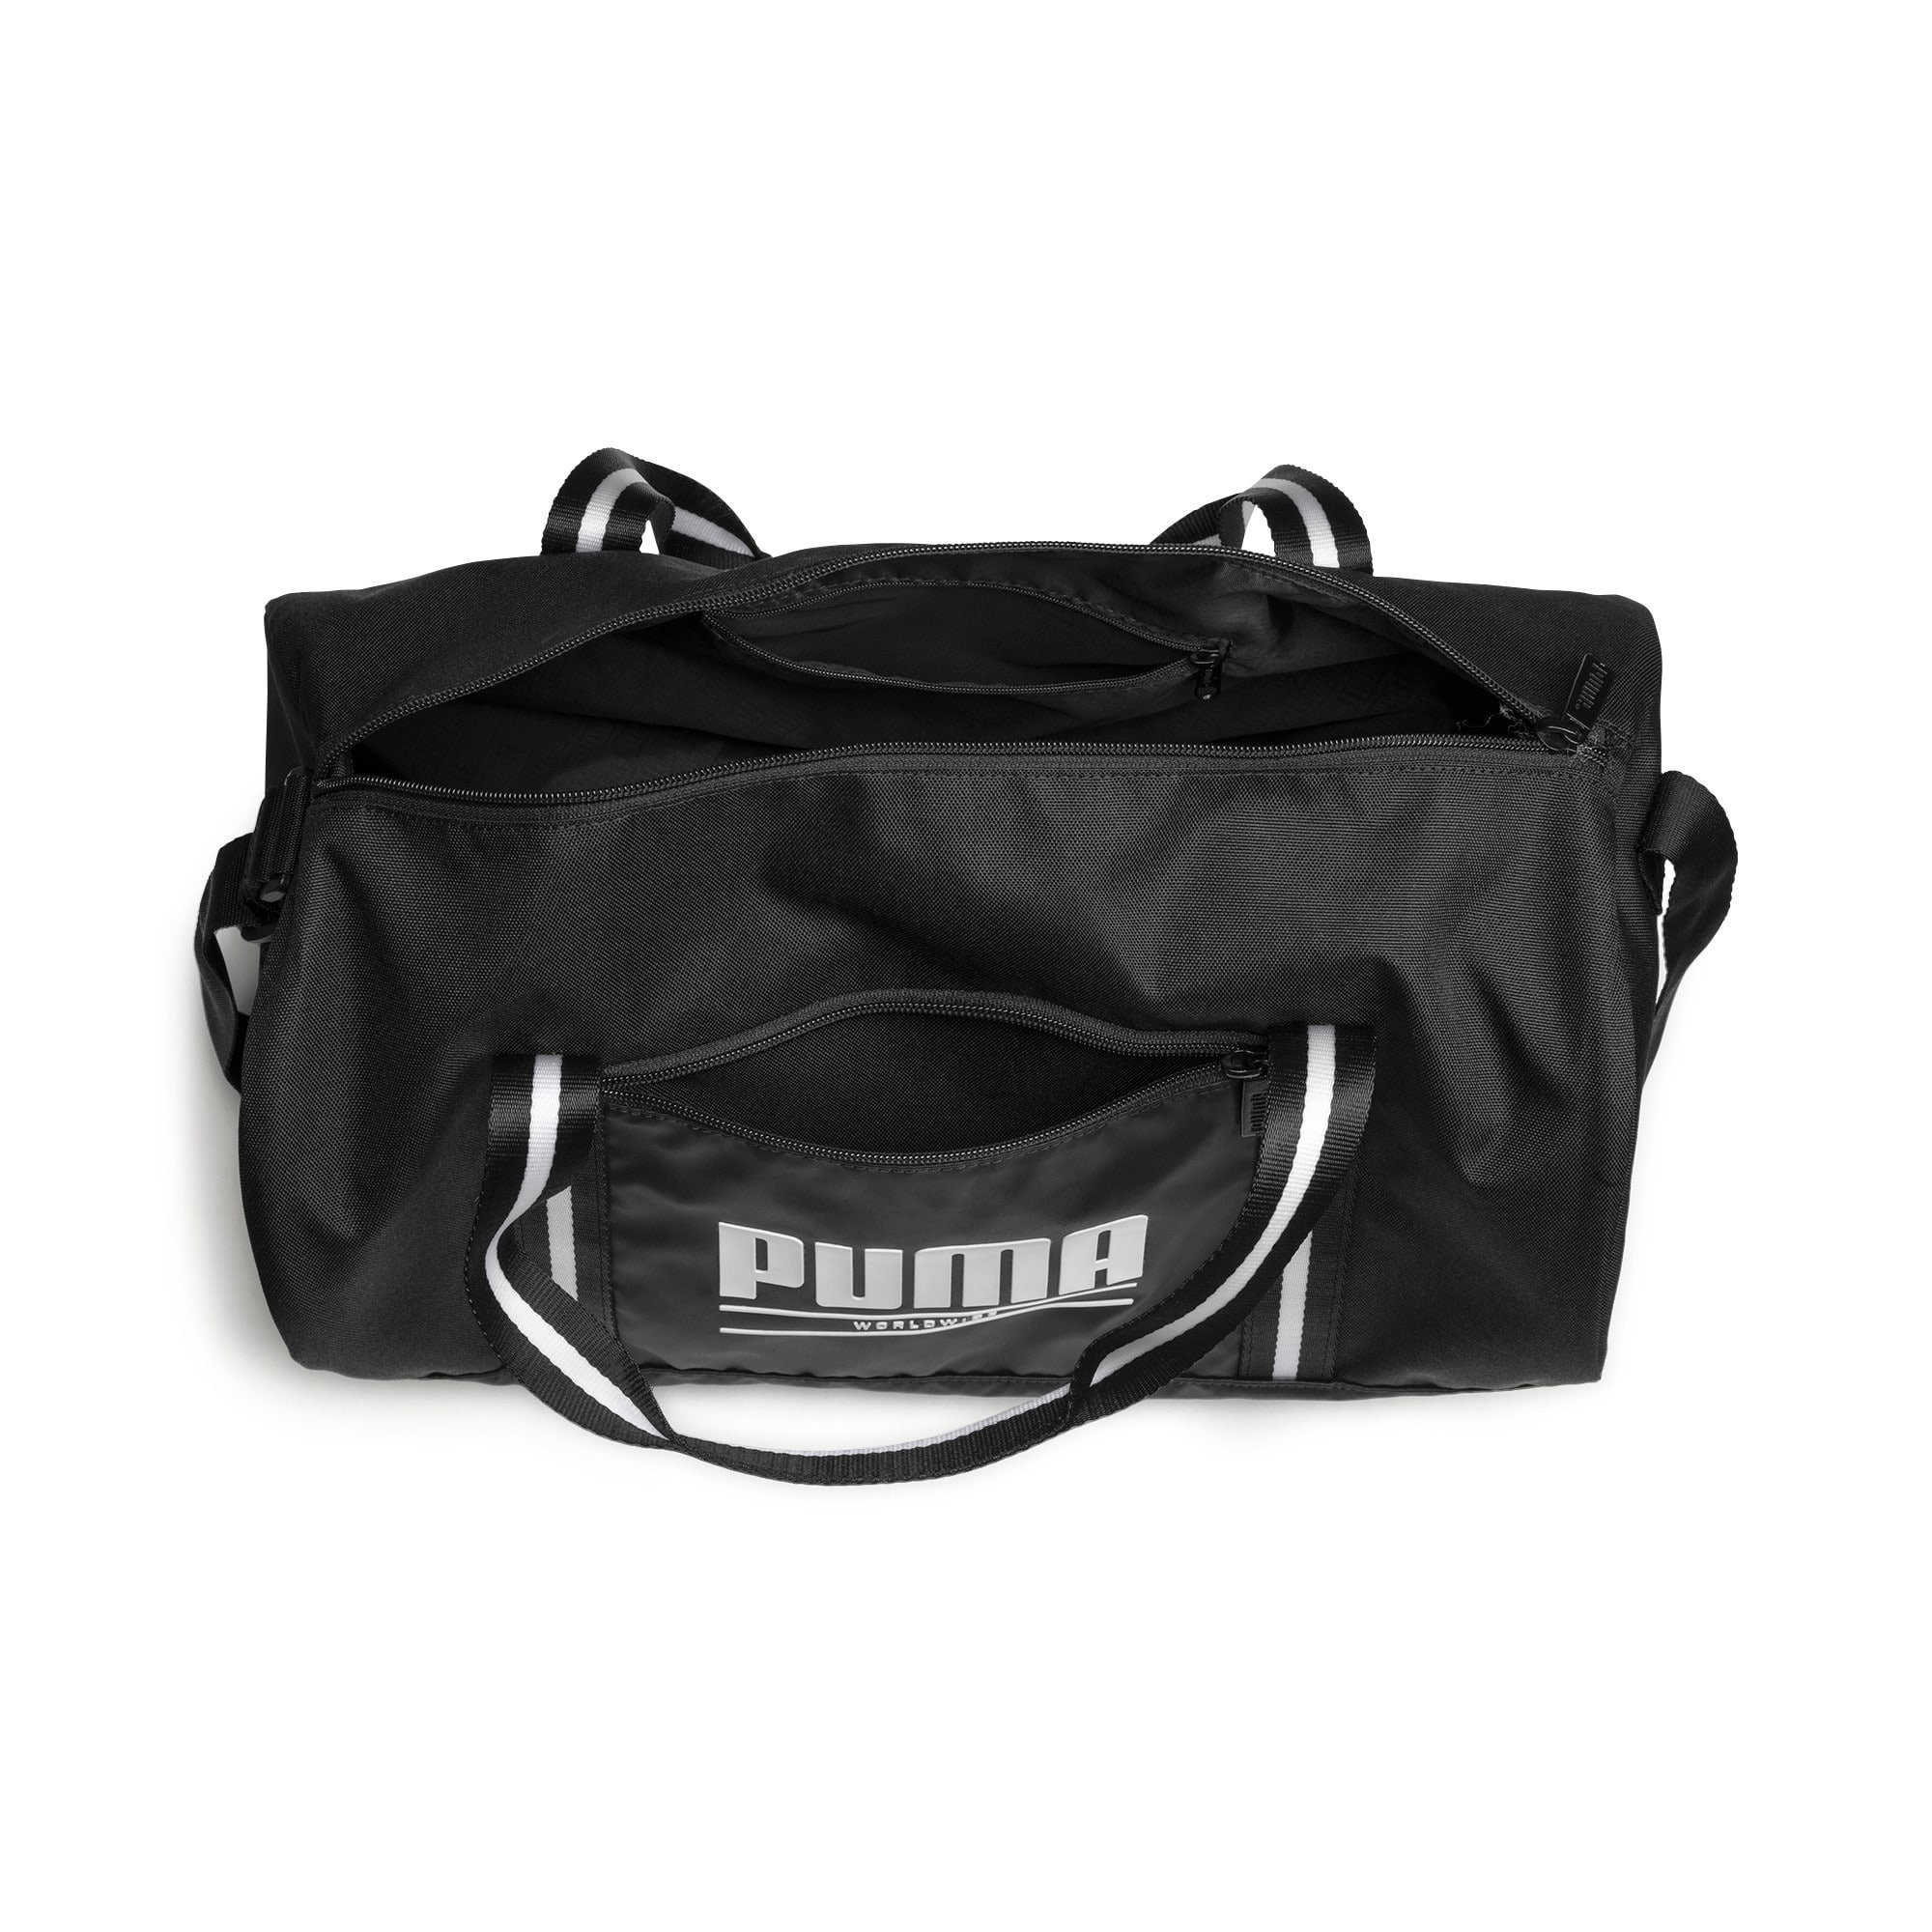 Thumbnail 4 of Base Women's Barrel Bag, Puma Black, medium-IND